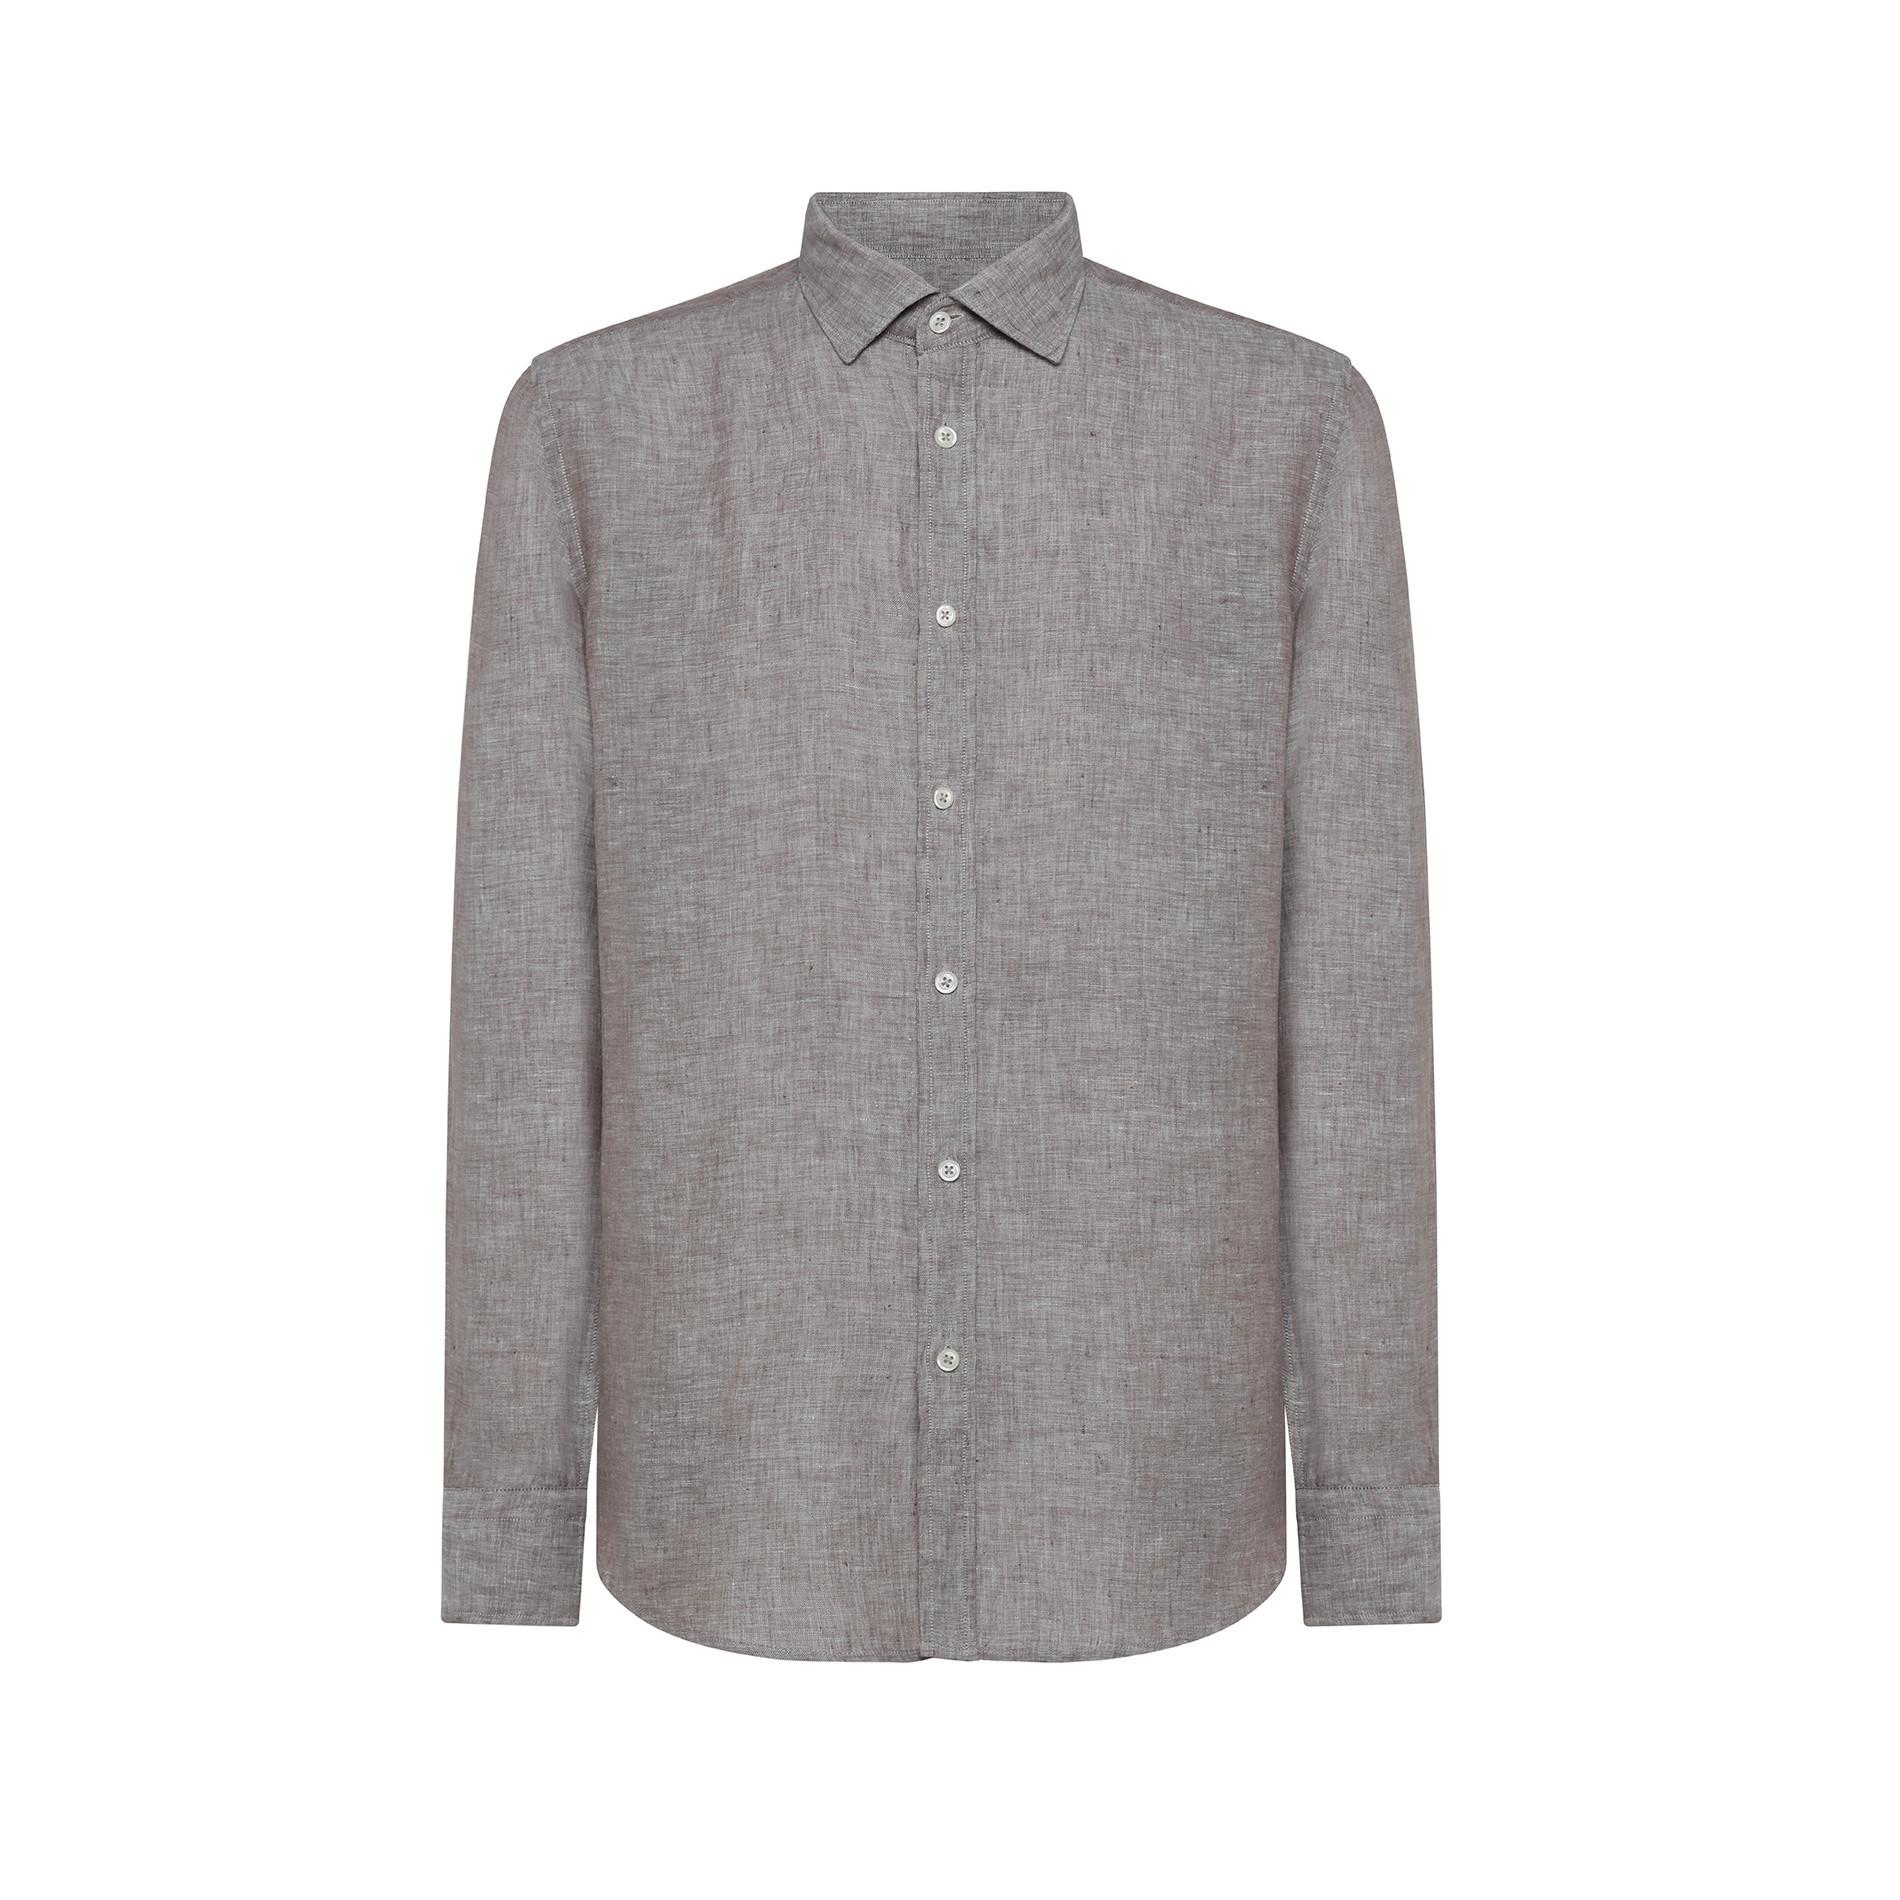 Camicia puro lino regular fit Luca D'Altieri, Marrone chiaro, large image number 0